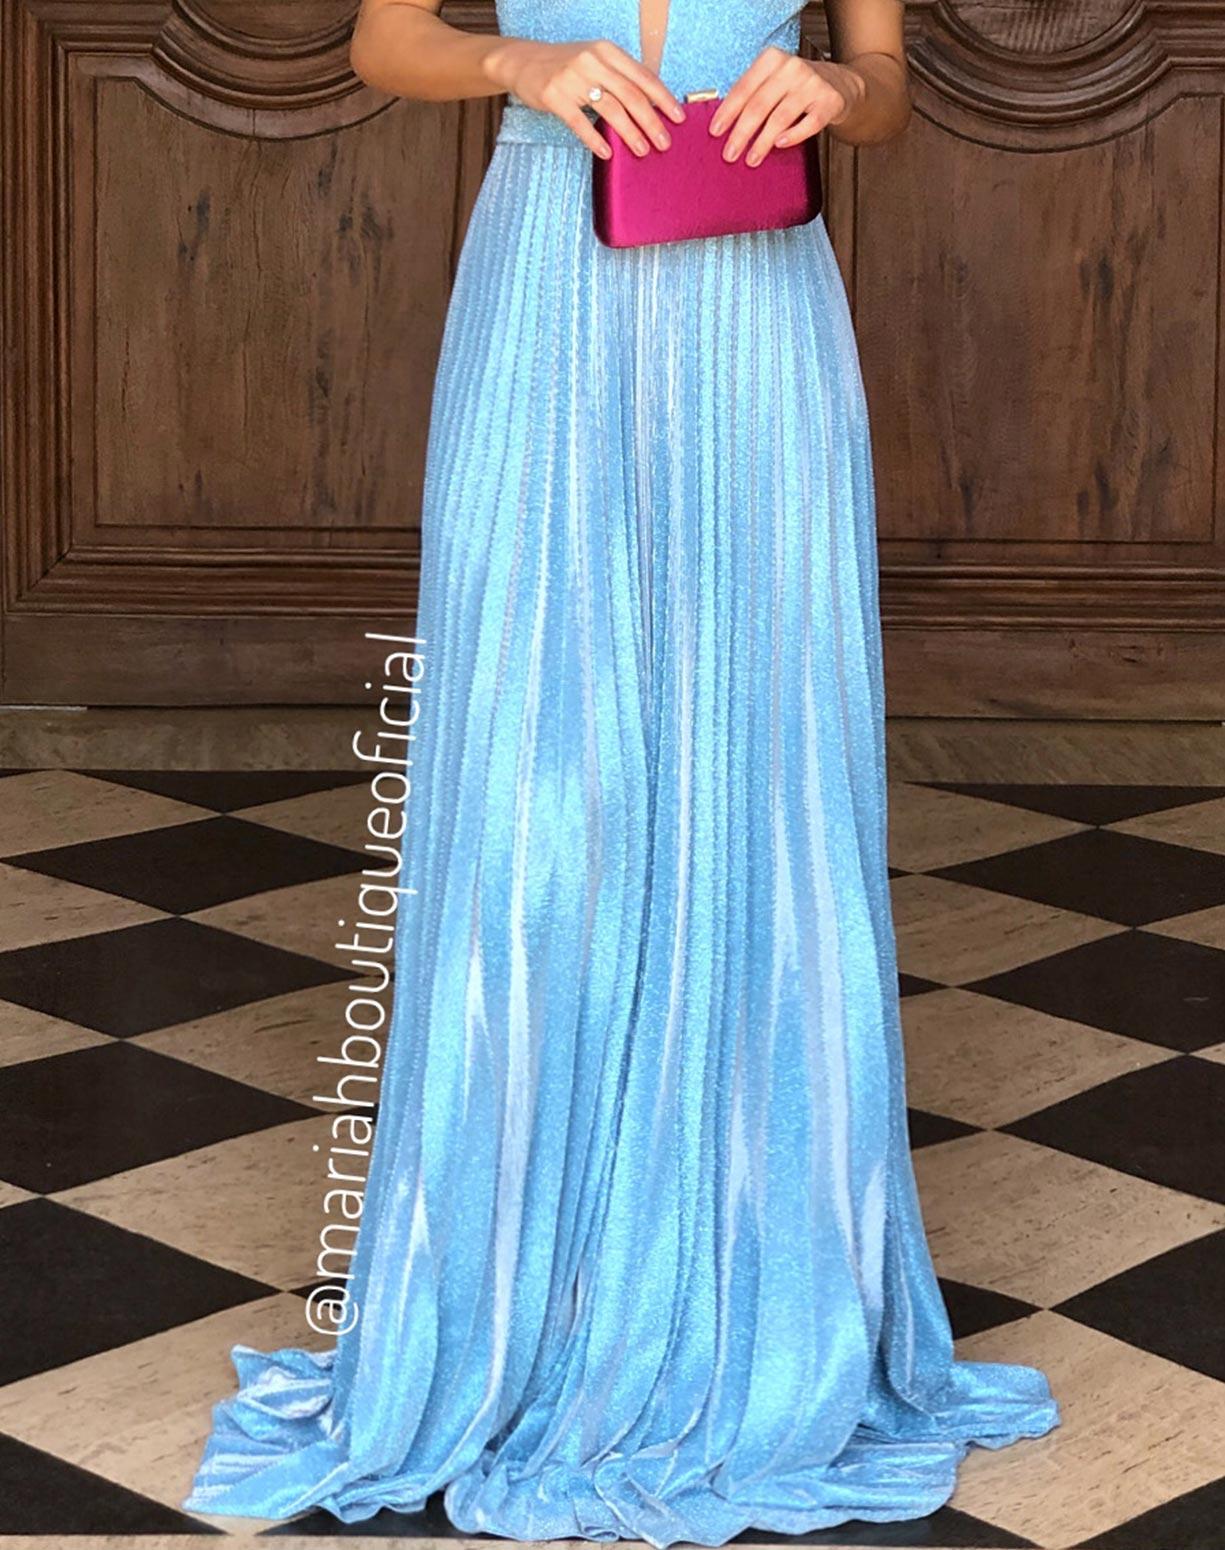 Vestido Azul Serenity em Lurex com Glitter